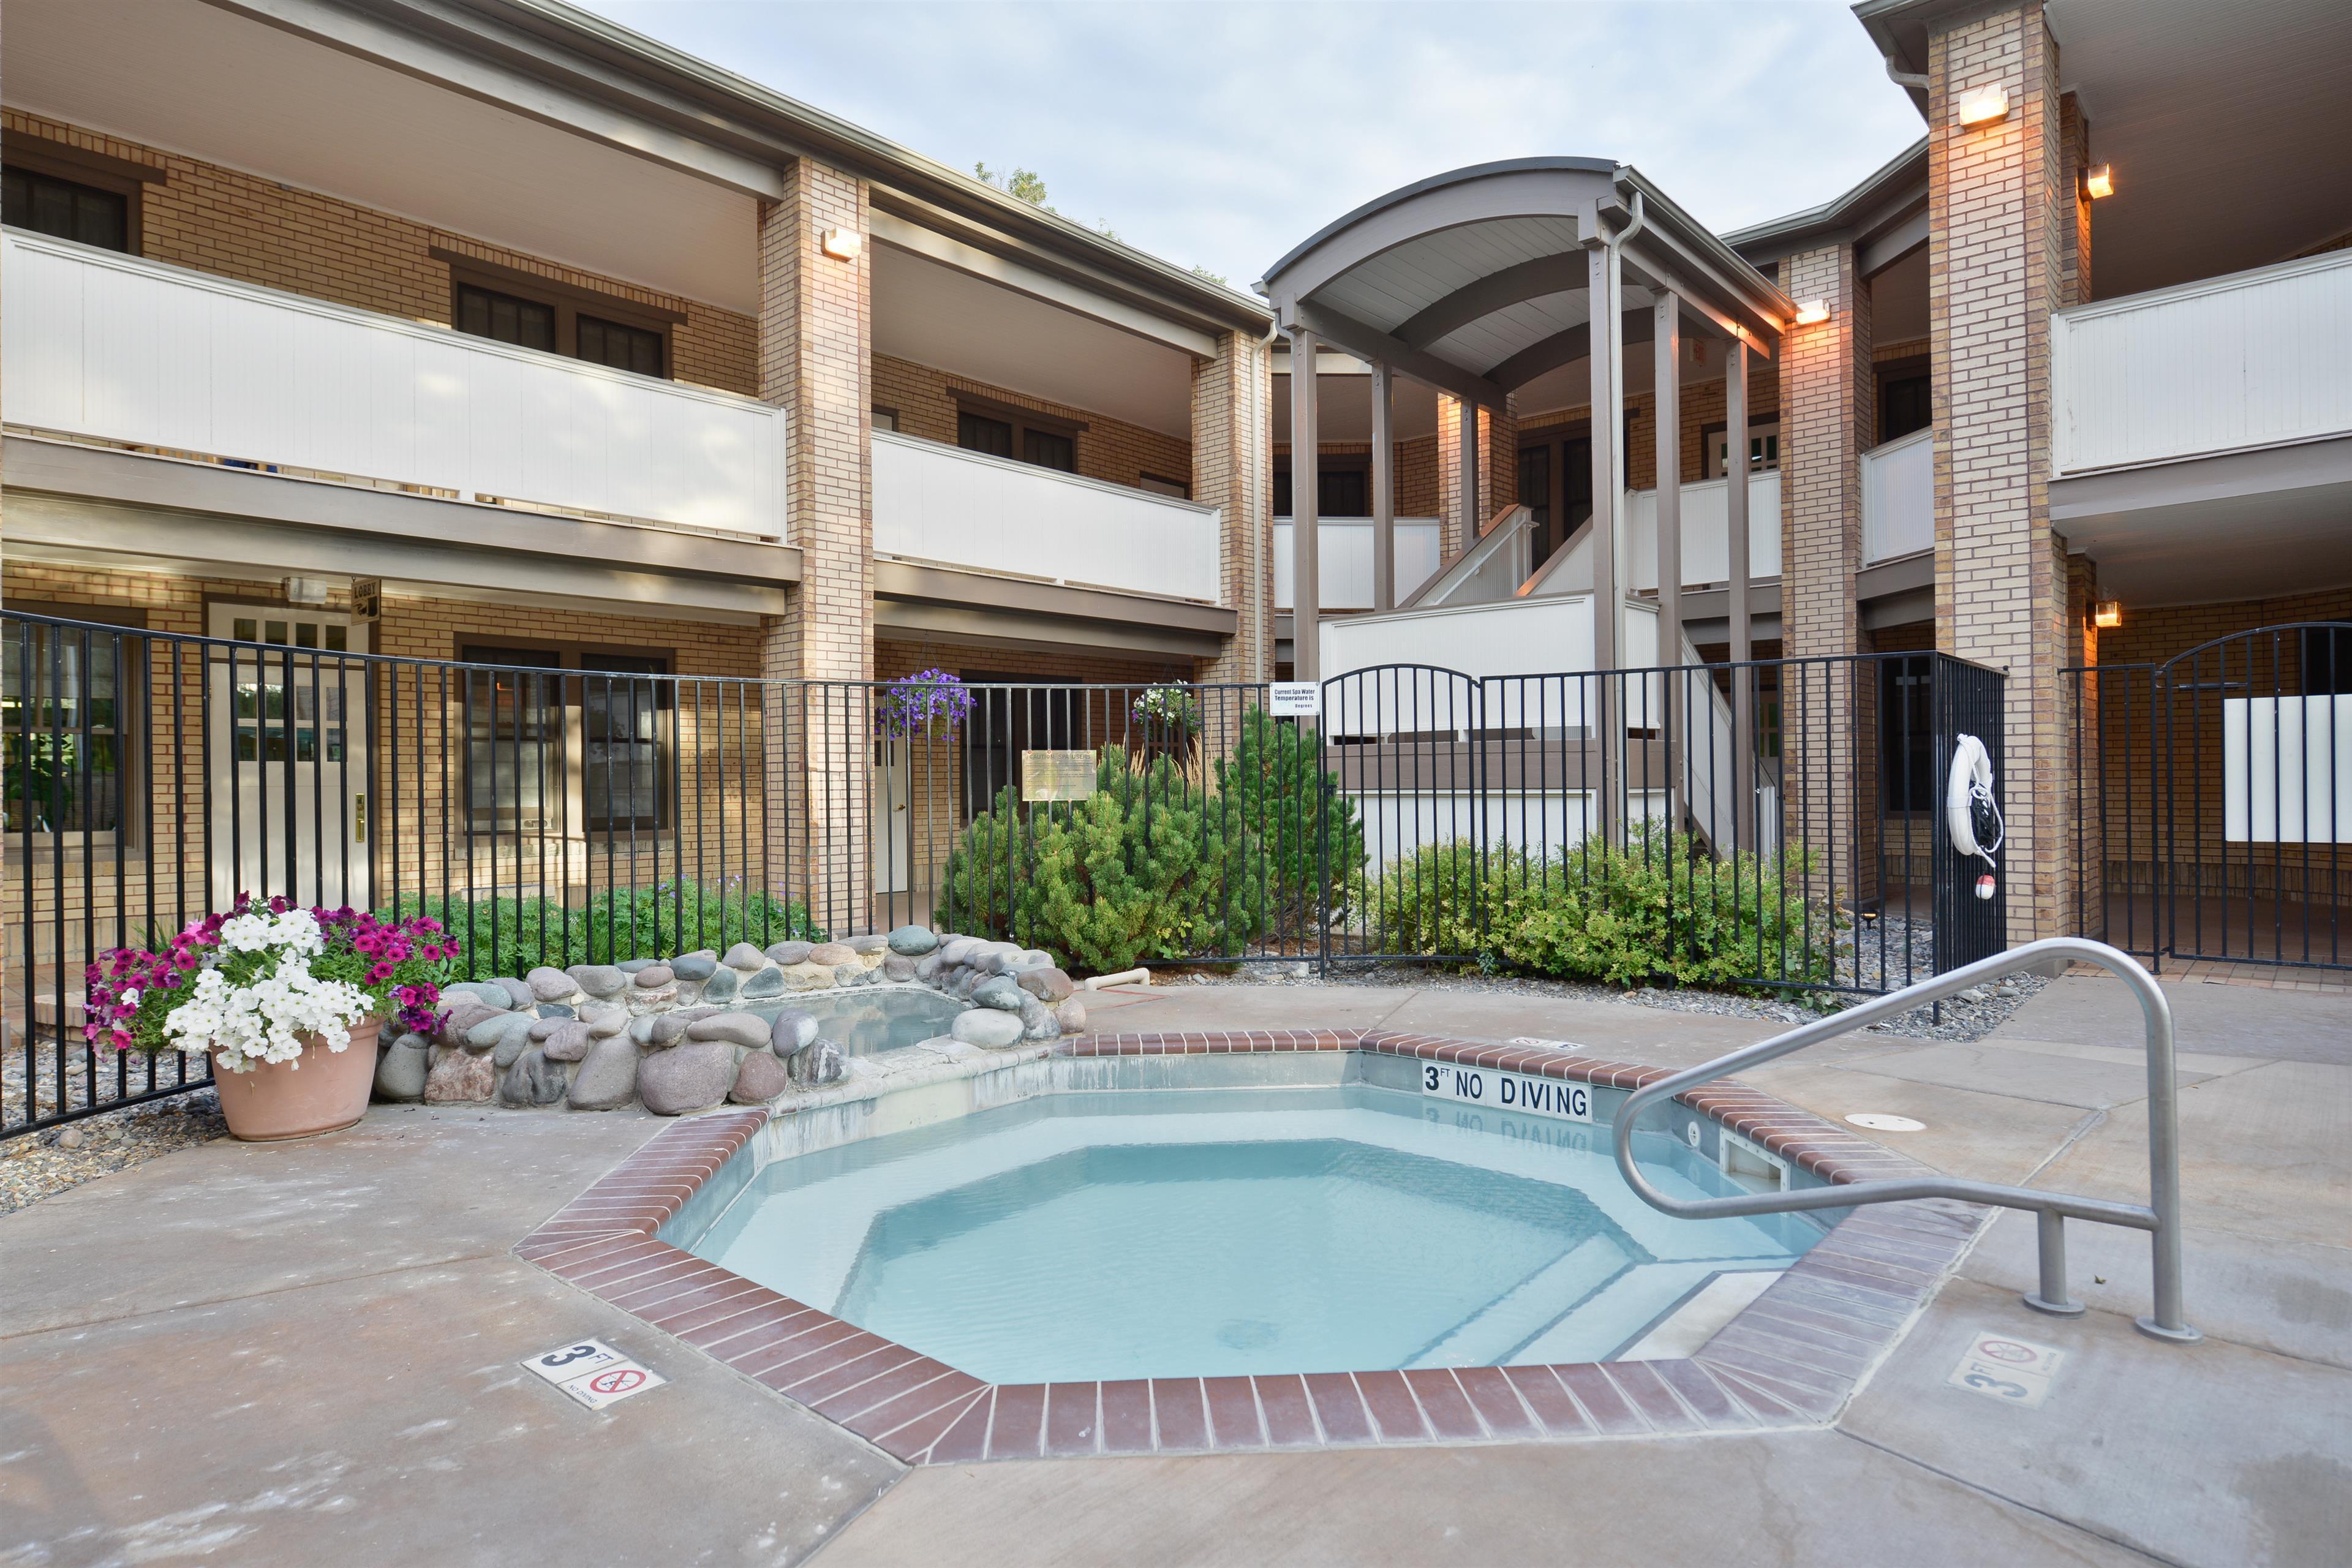 Best Western Plus Plaza Hotel image 18